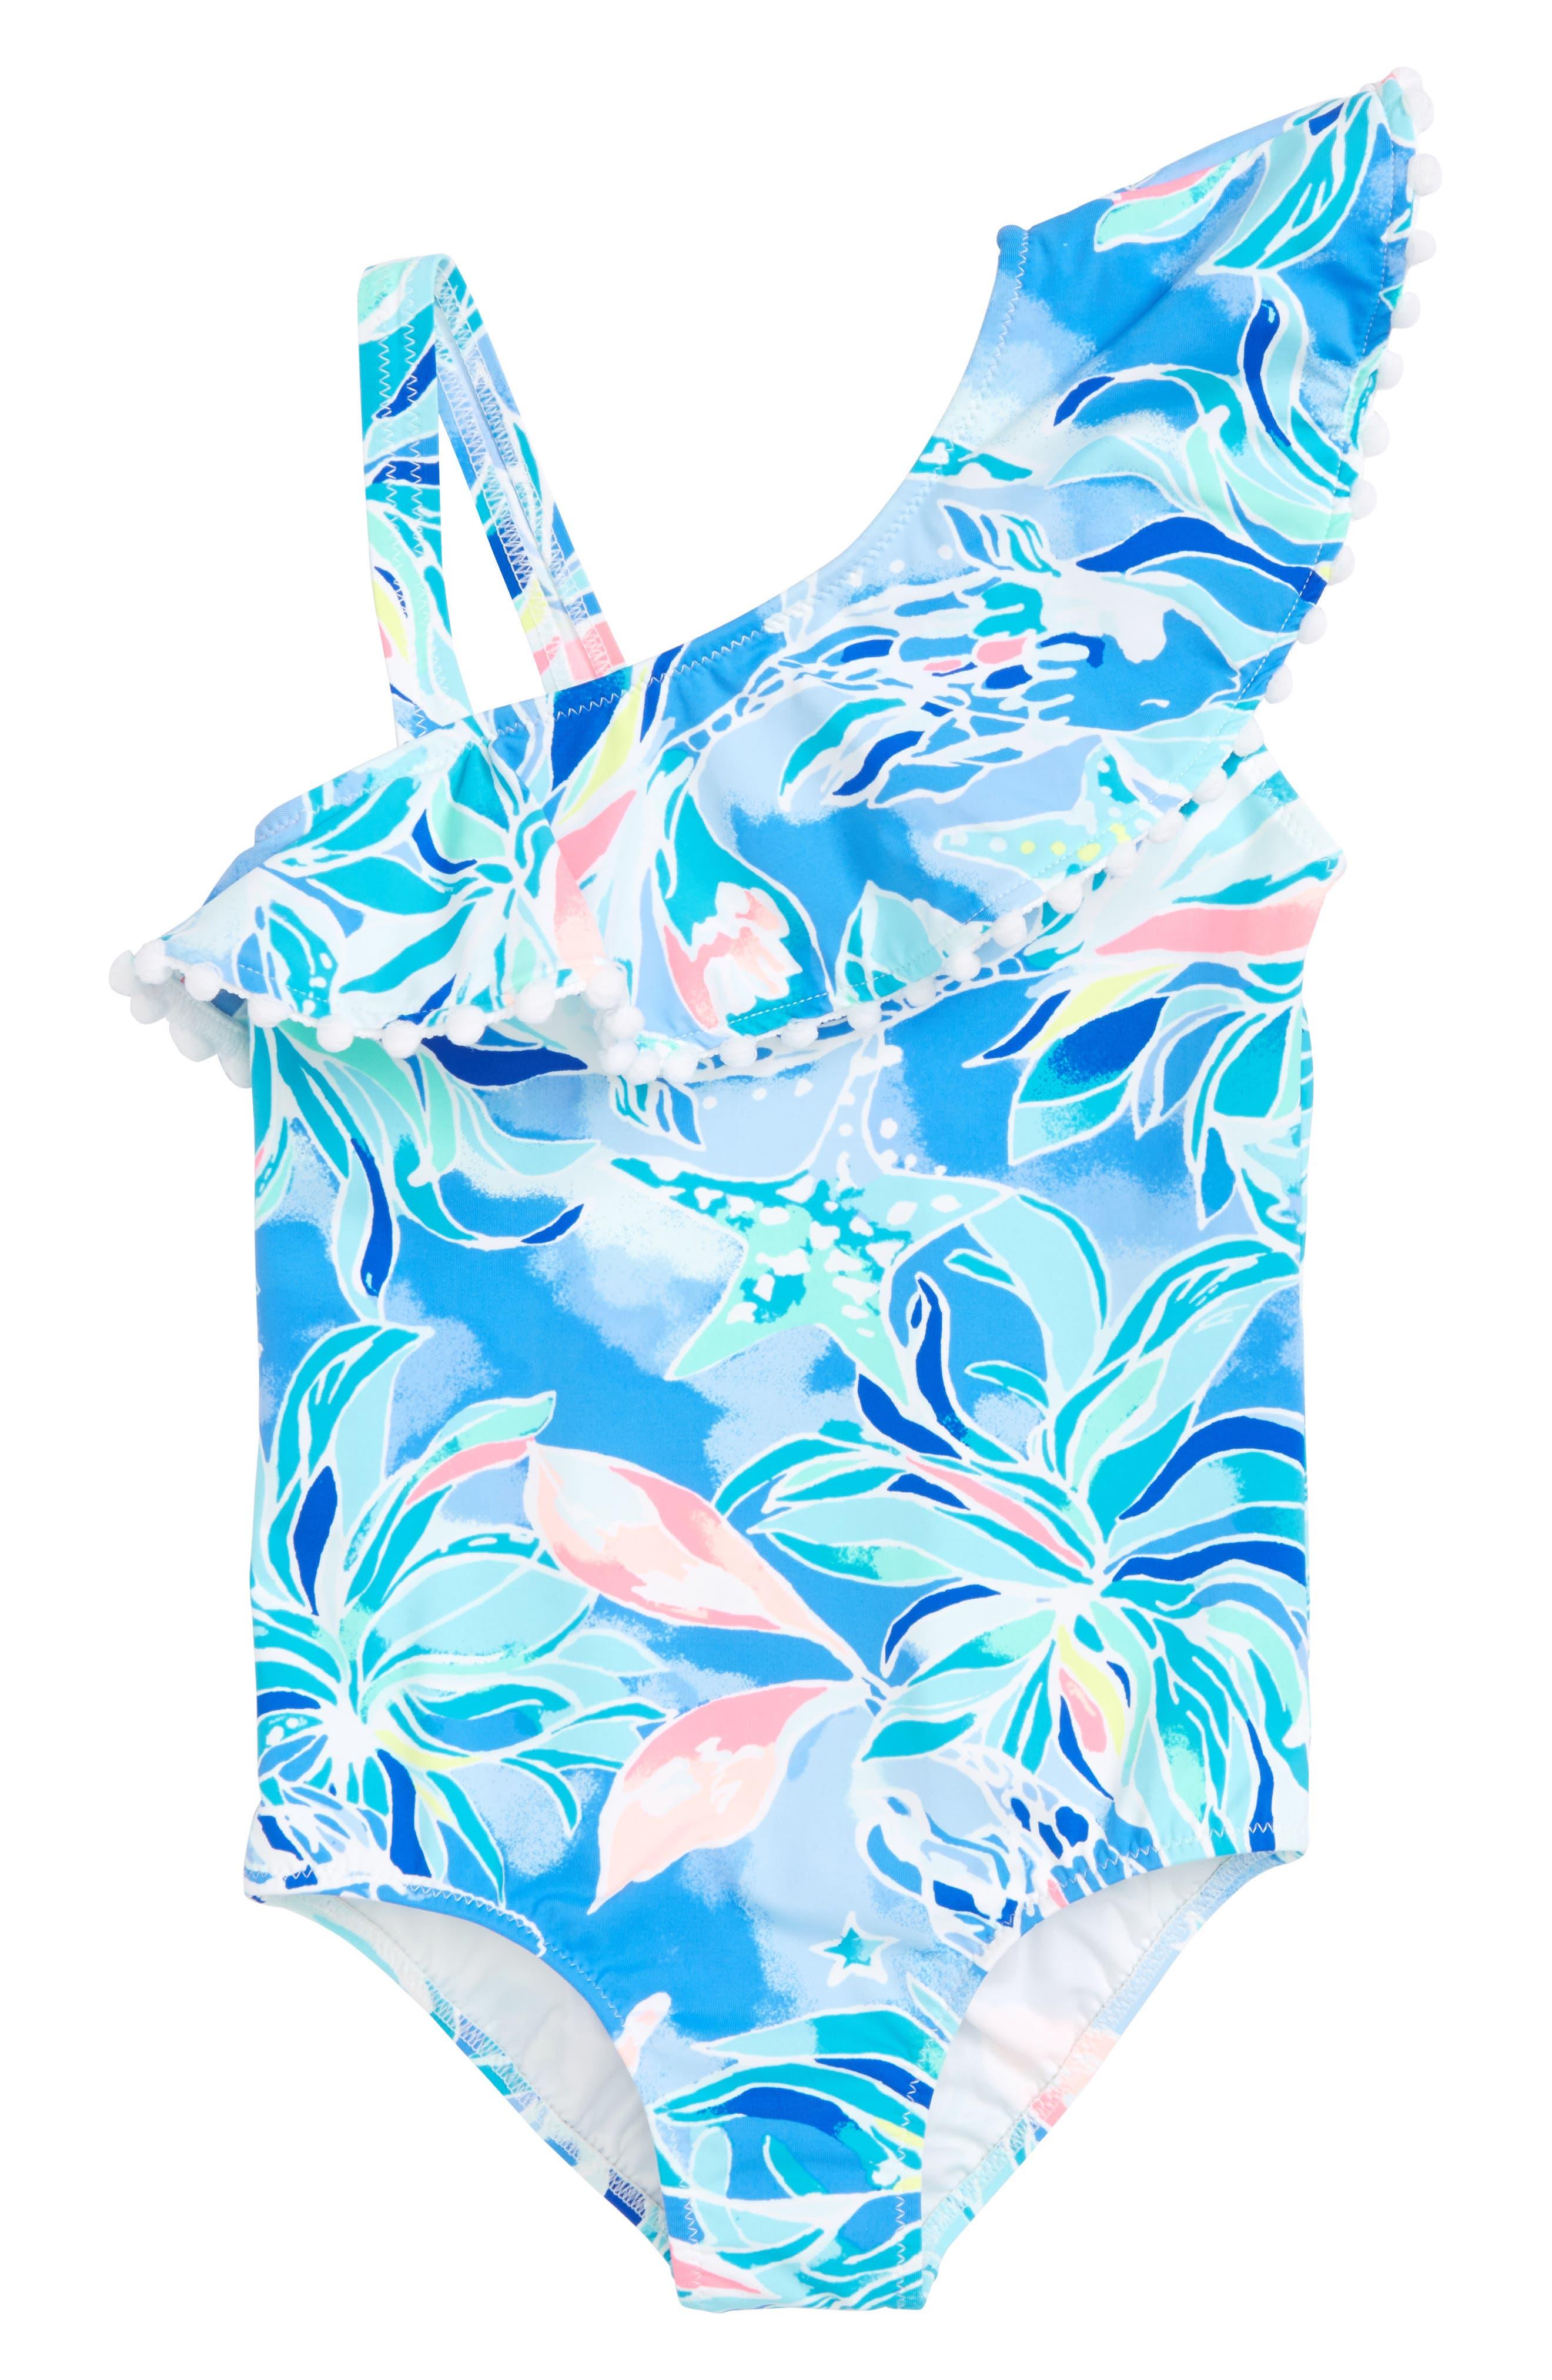 Joni Ruffle One-Piece Swimsuit,                             Main thumbnail 1, color,                             Bennet Blue Celestial Seas